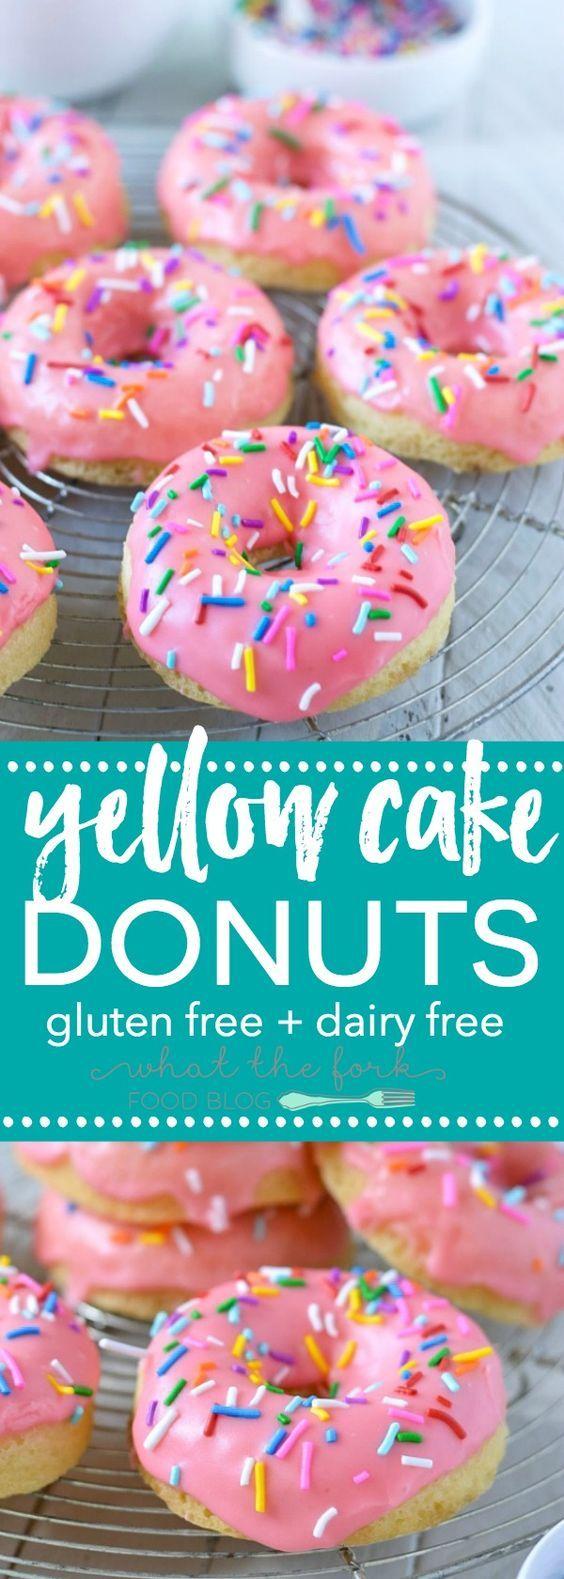 6883 best Gluten Free images on Pinterest | Gluten free recipes ...